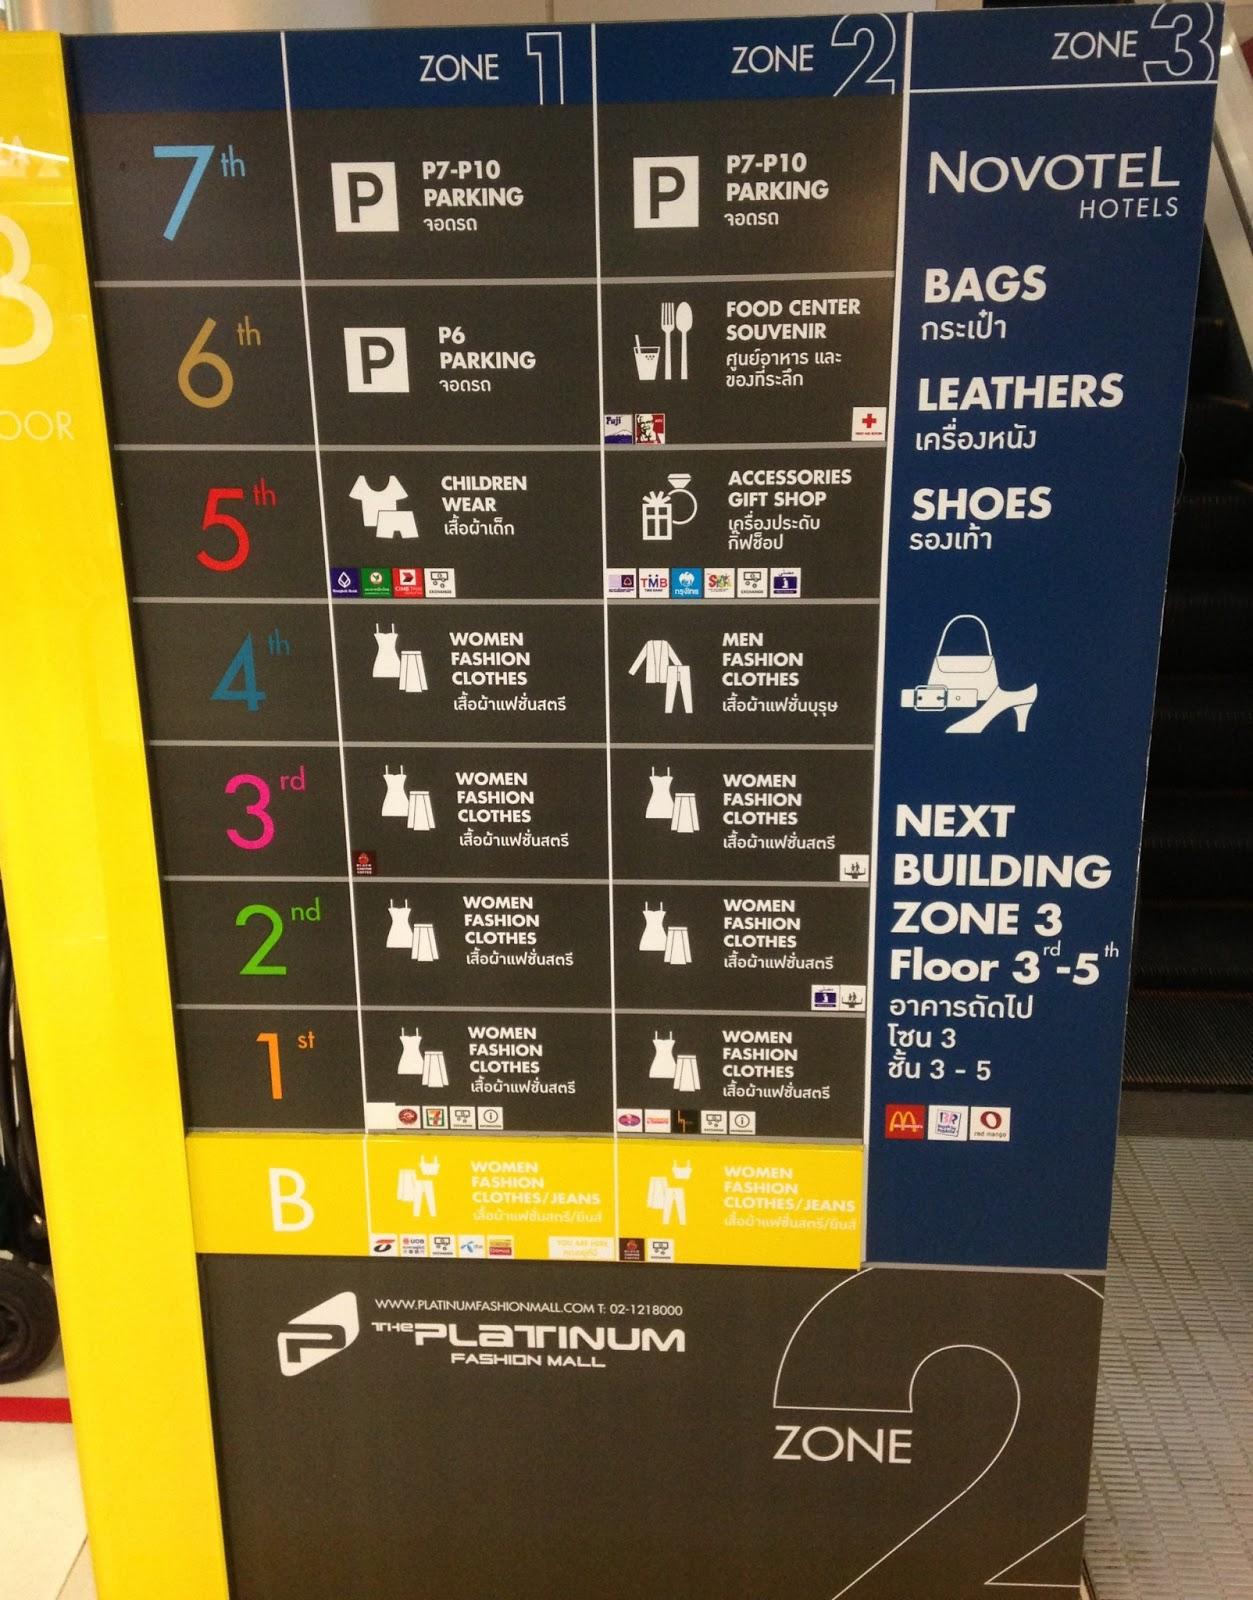 The Platinum Fashion Mall Directory